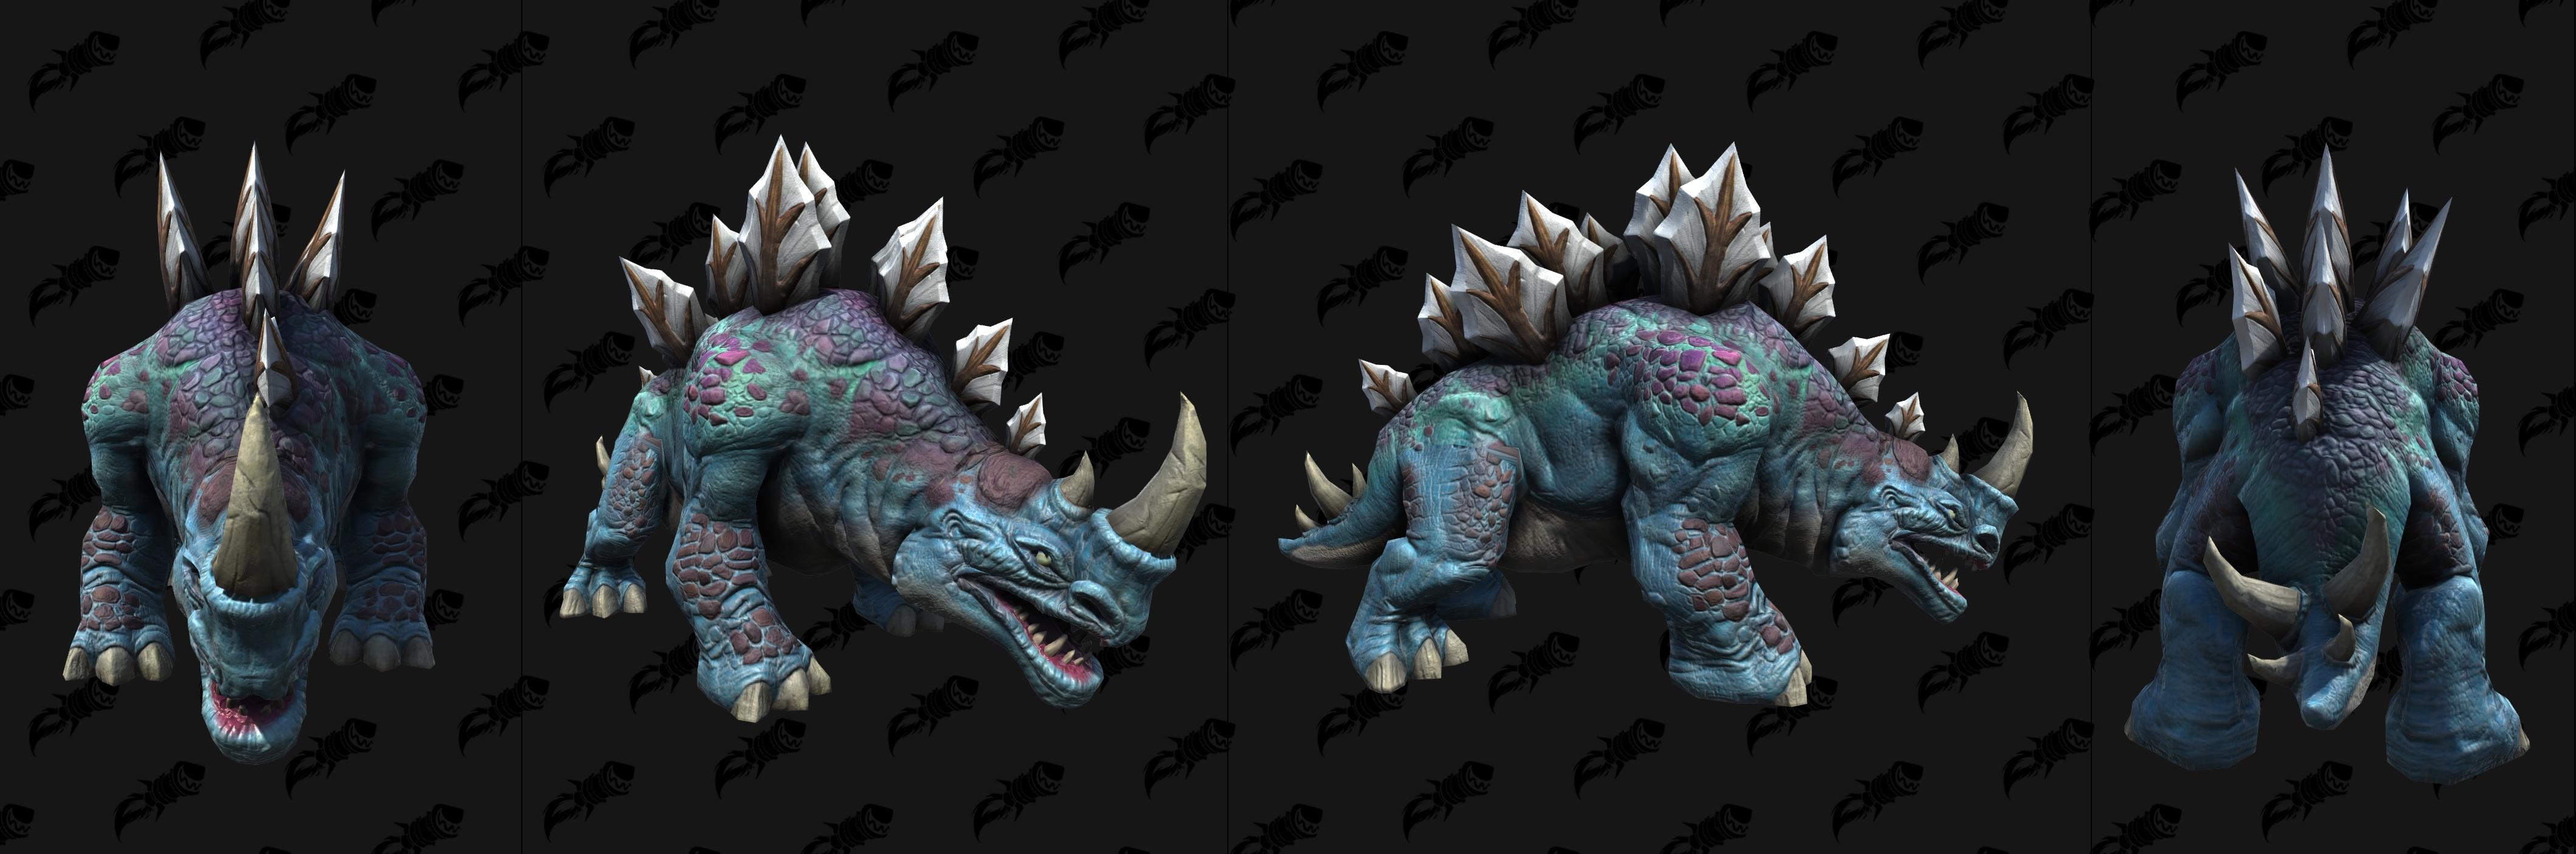 Warcraft III Reforged Models - Lizards - Wowhead News